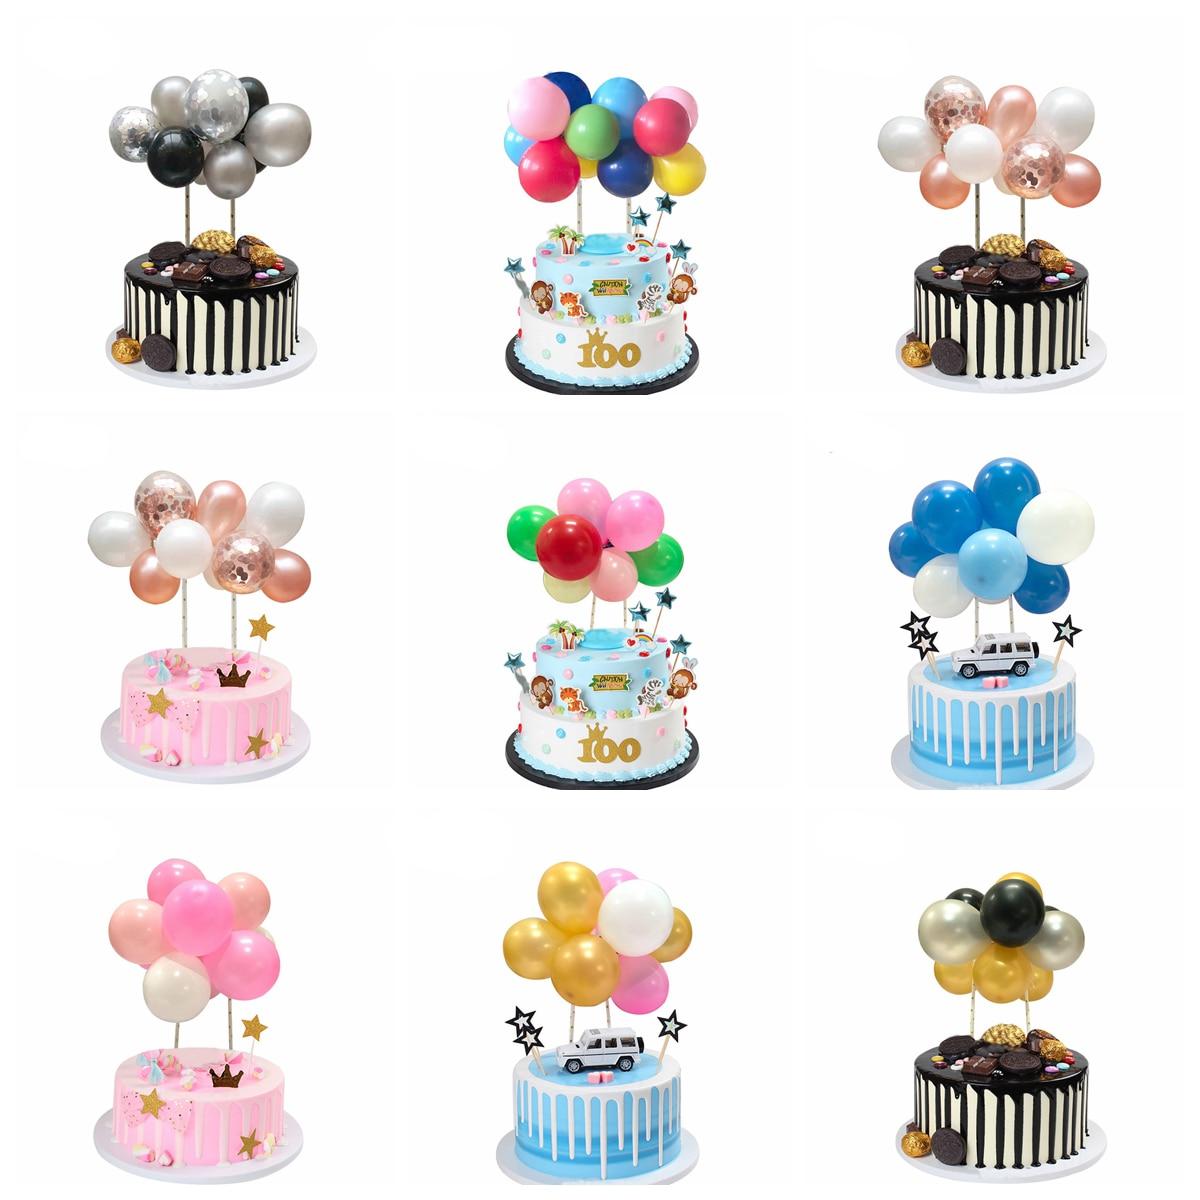 Rose Gold Balloon Cake Topper Happy Birthday Party Decor Kids Wedding Birthday Cake Decor Baby Shower One 1st Birthday Decor